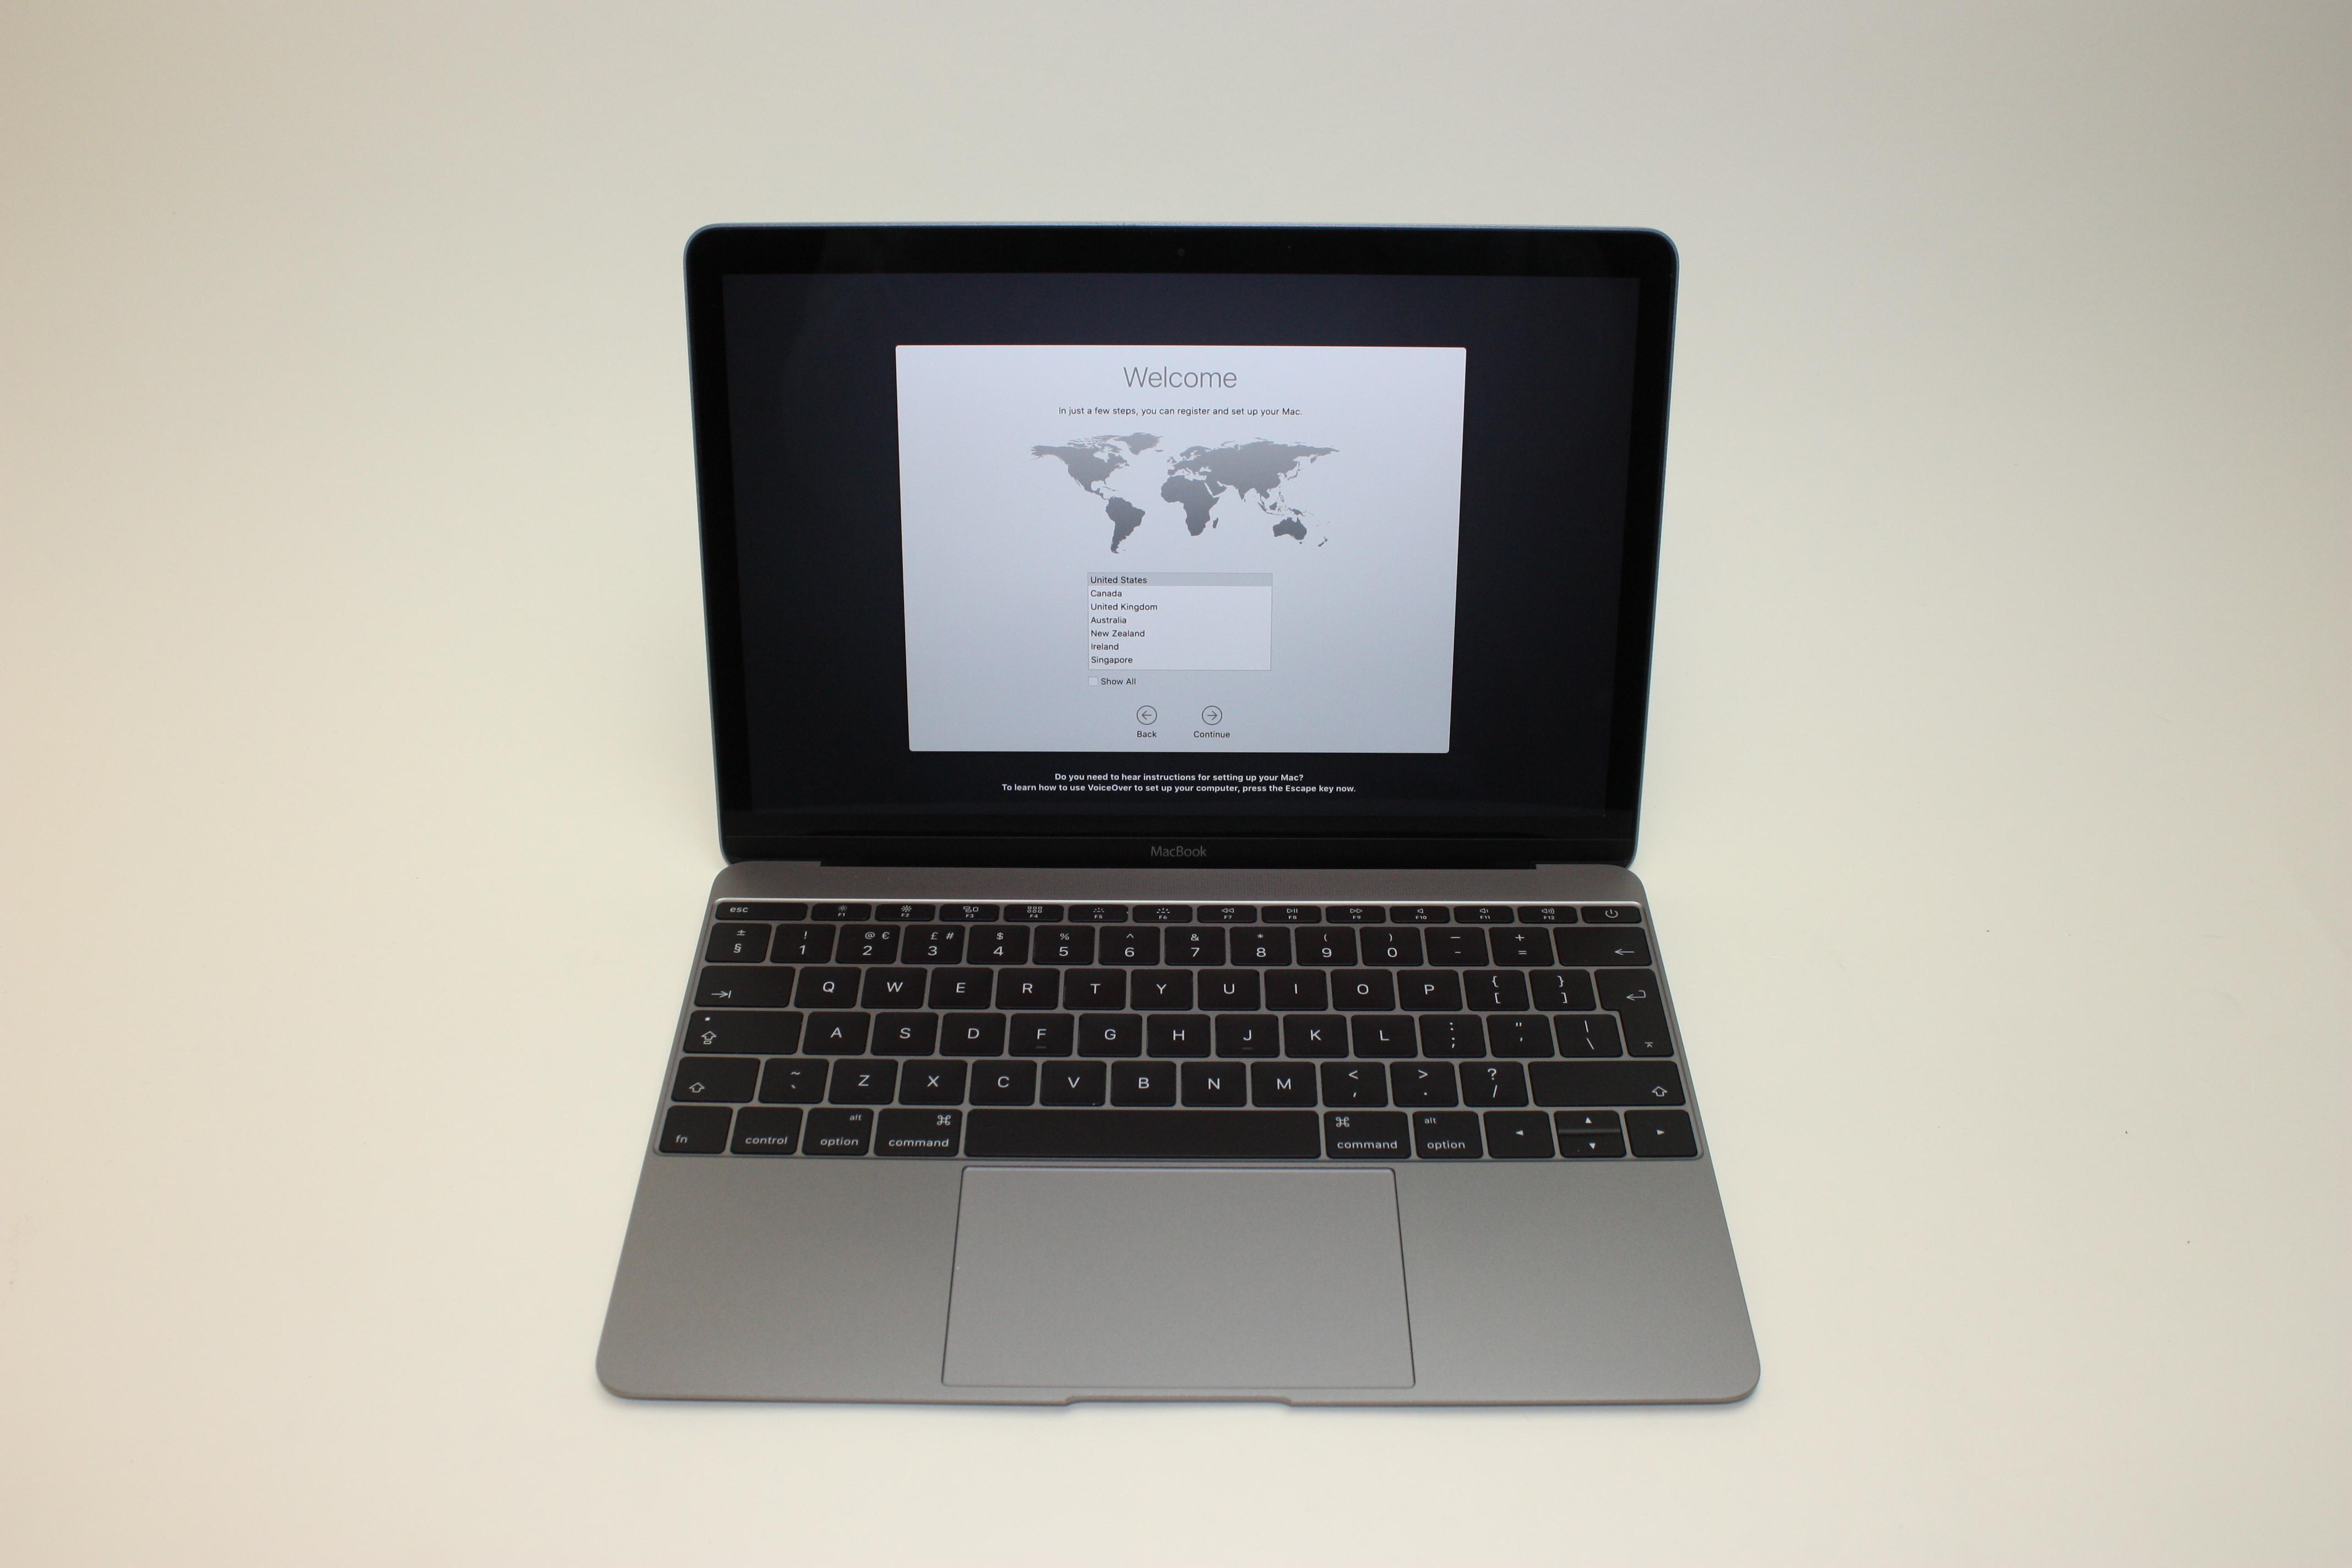 MacBook 12-inch Retina, 1.3 GHz Core M (M-5Y71), 8 GB 1867 MHz DDR3, 256 GB Flash Storage, image 1